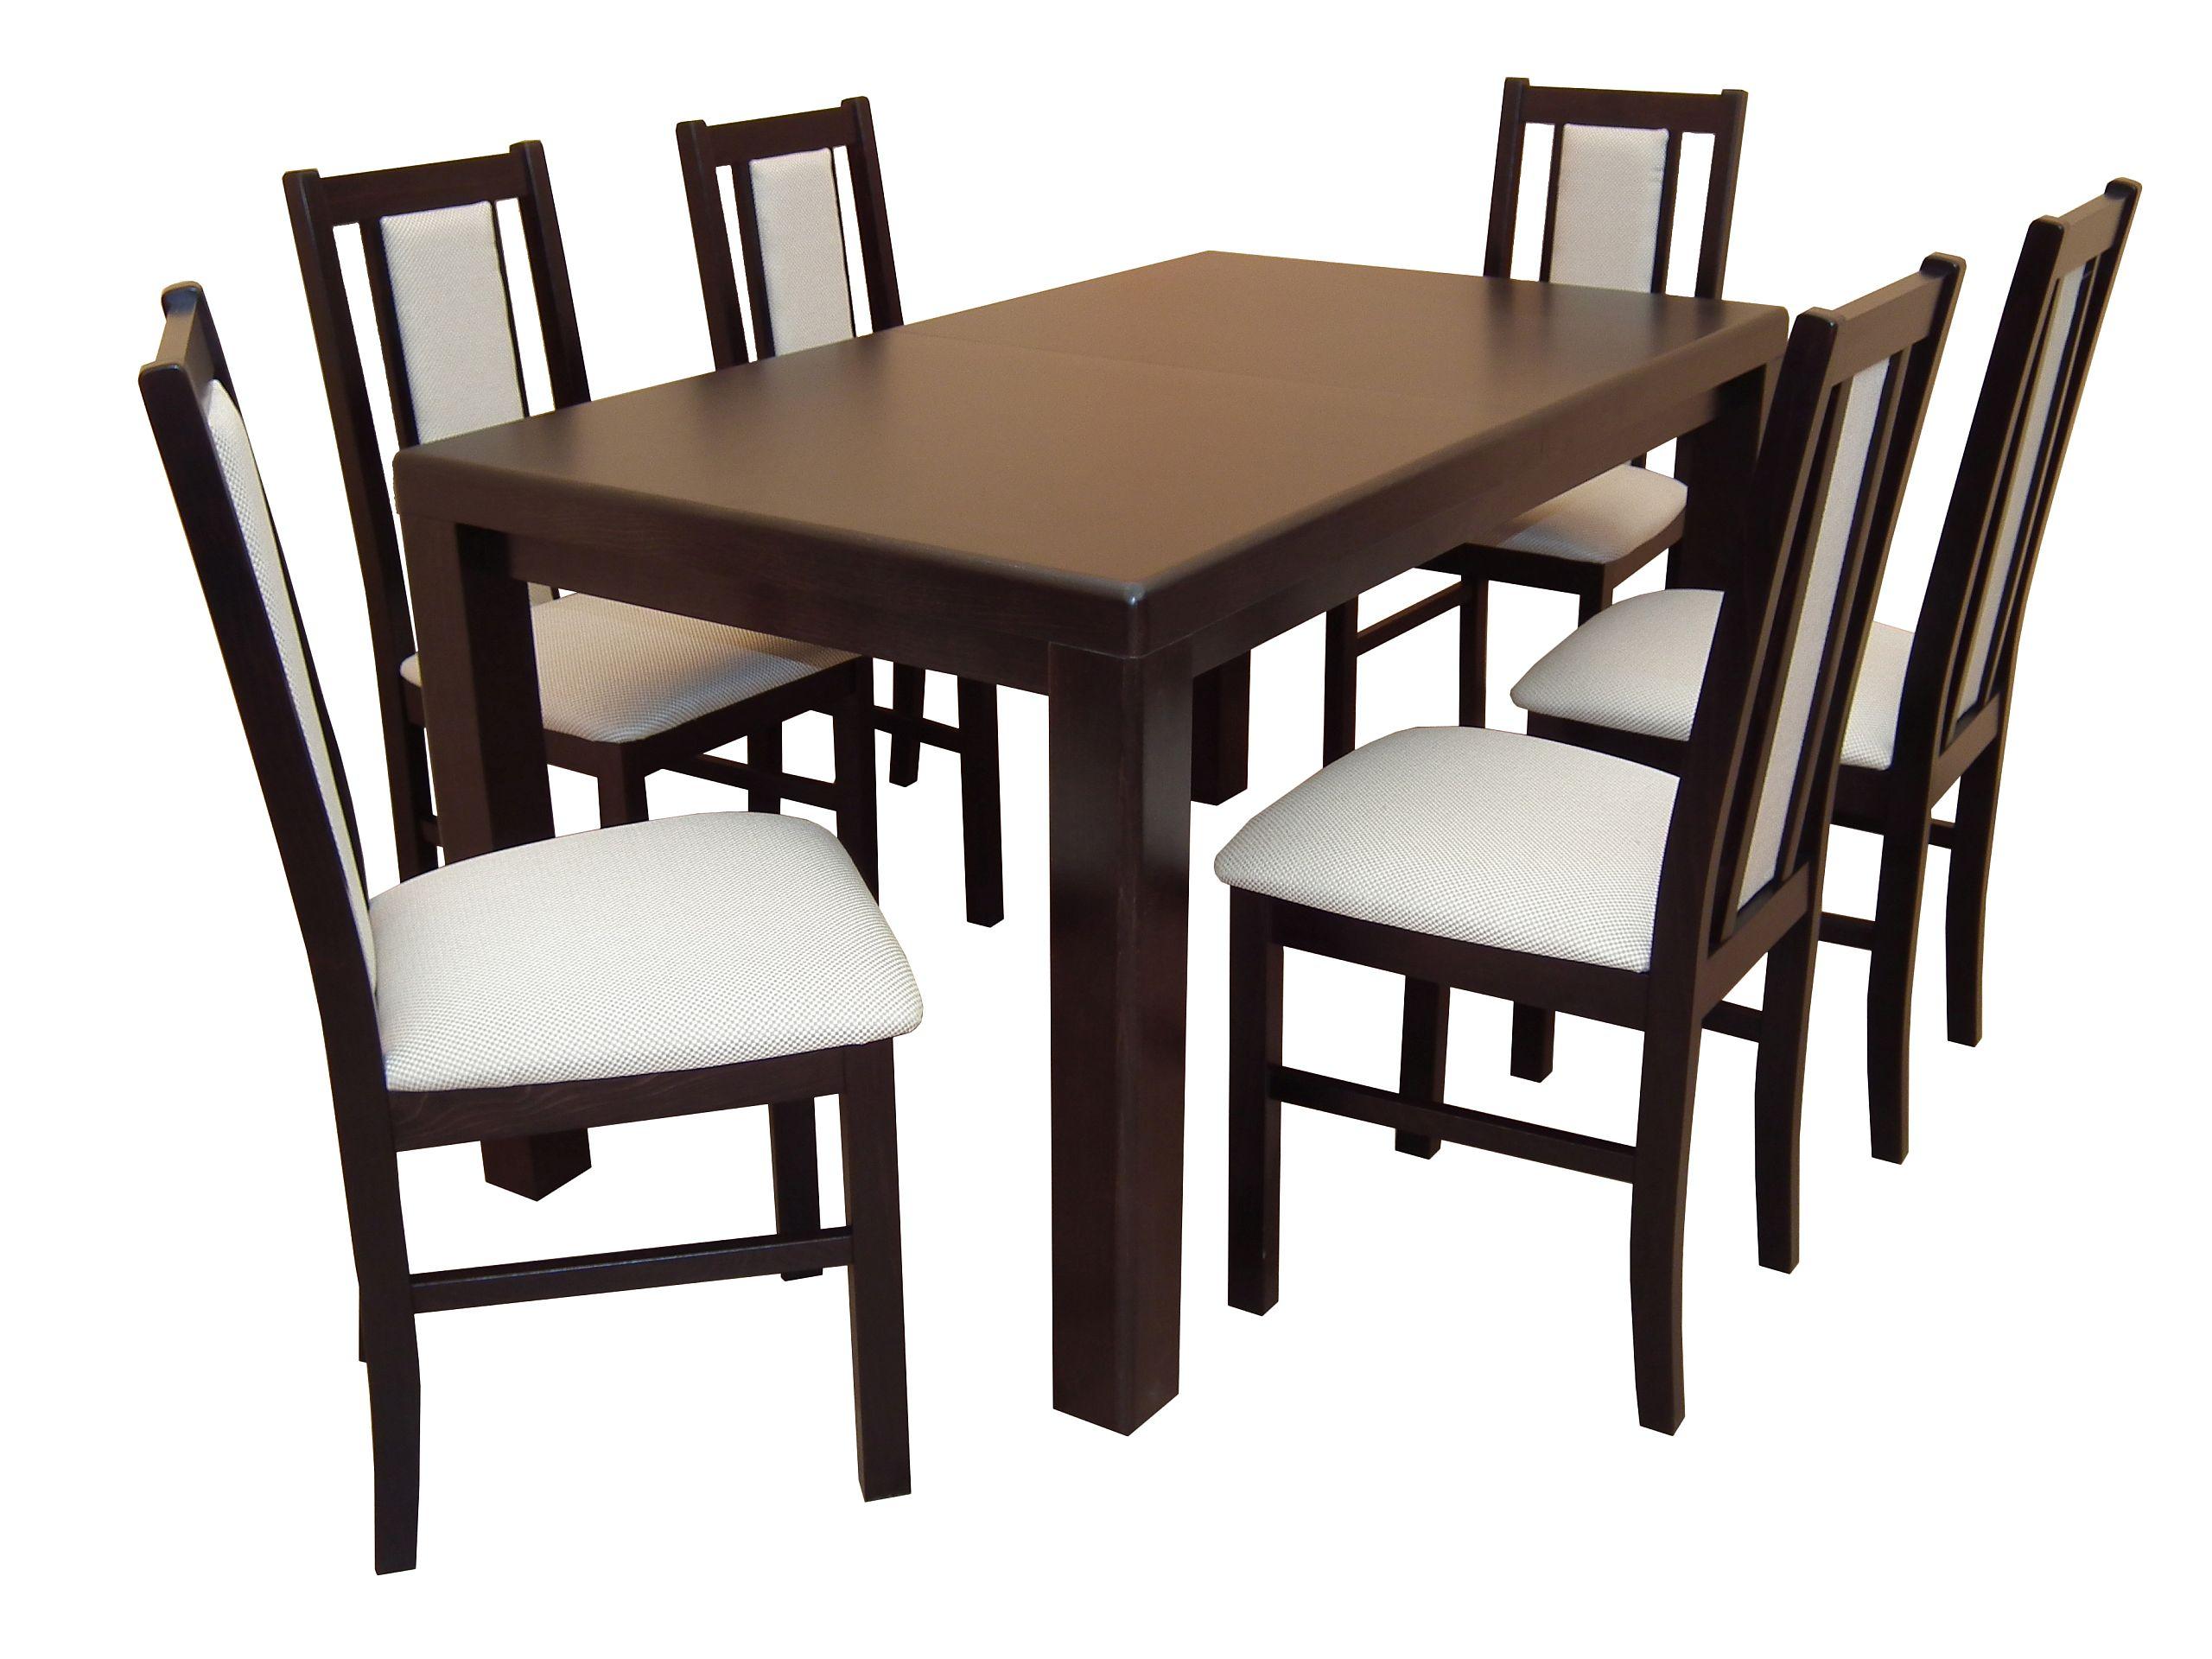 Solidny Komplet Do Salonu Jadalni Stol 6 Krzesel